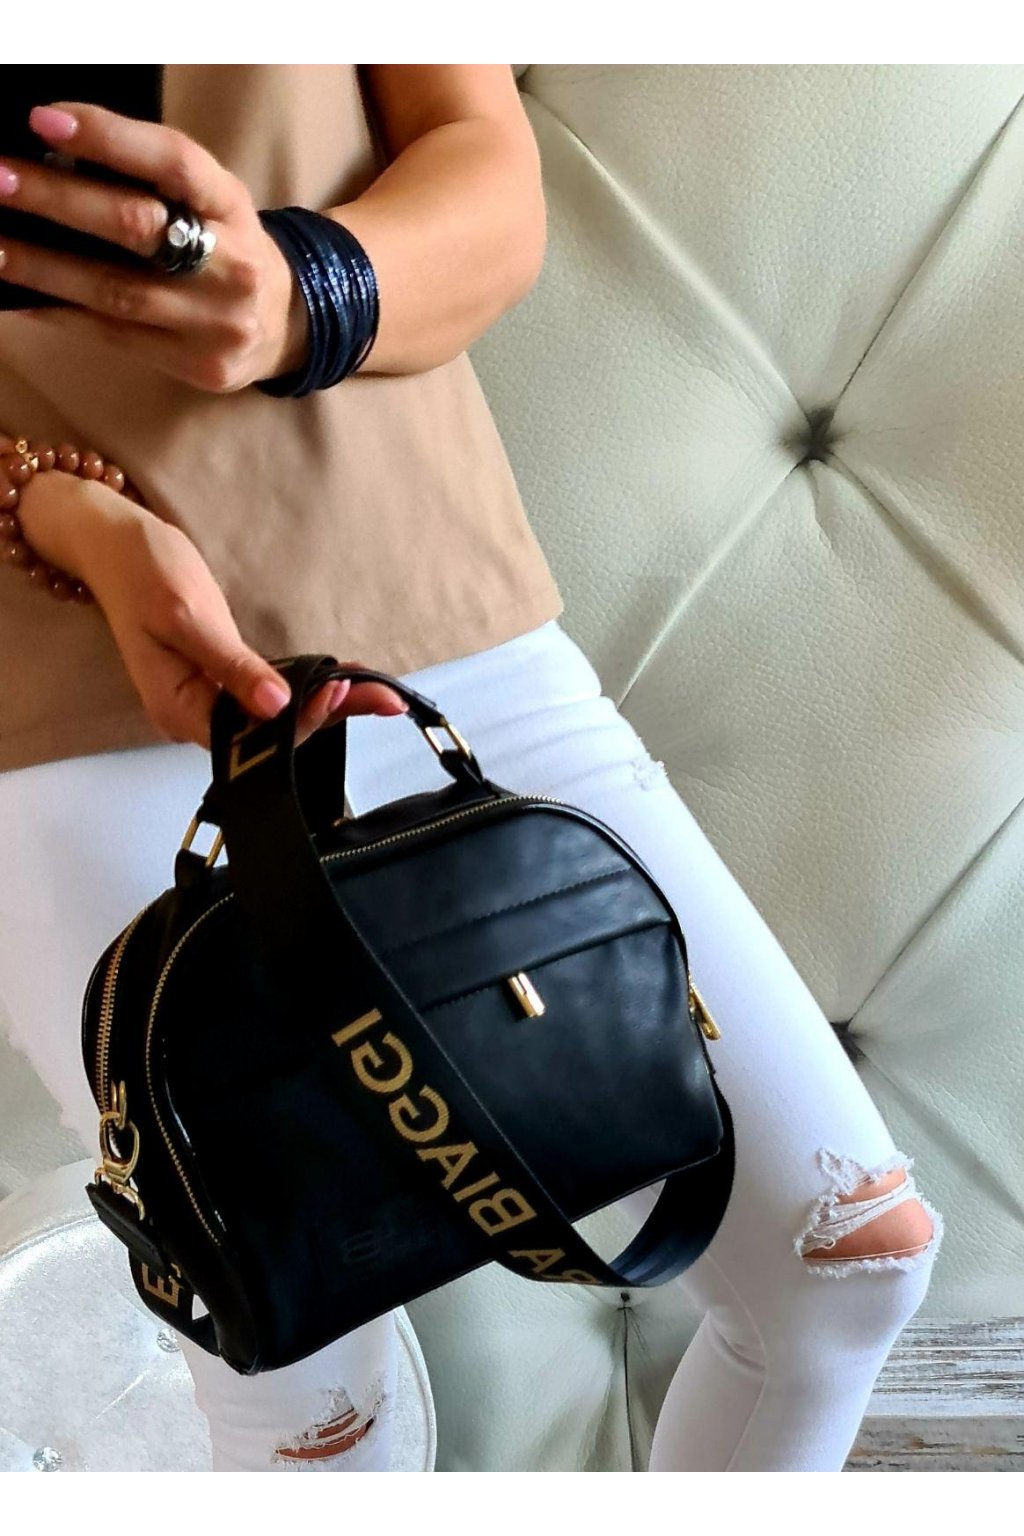 crossbody kufřík laura biaggi černá barva trendy